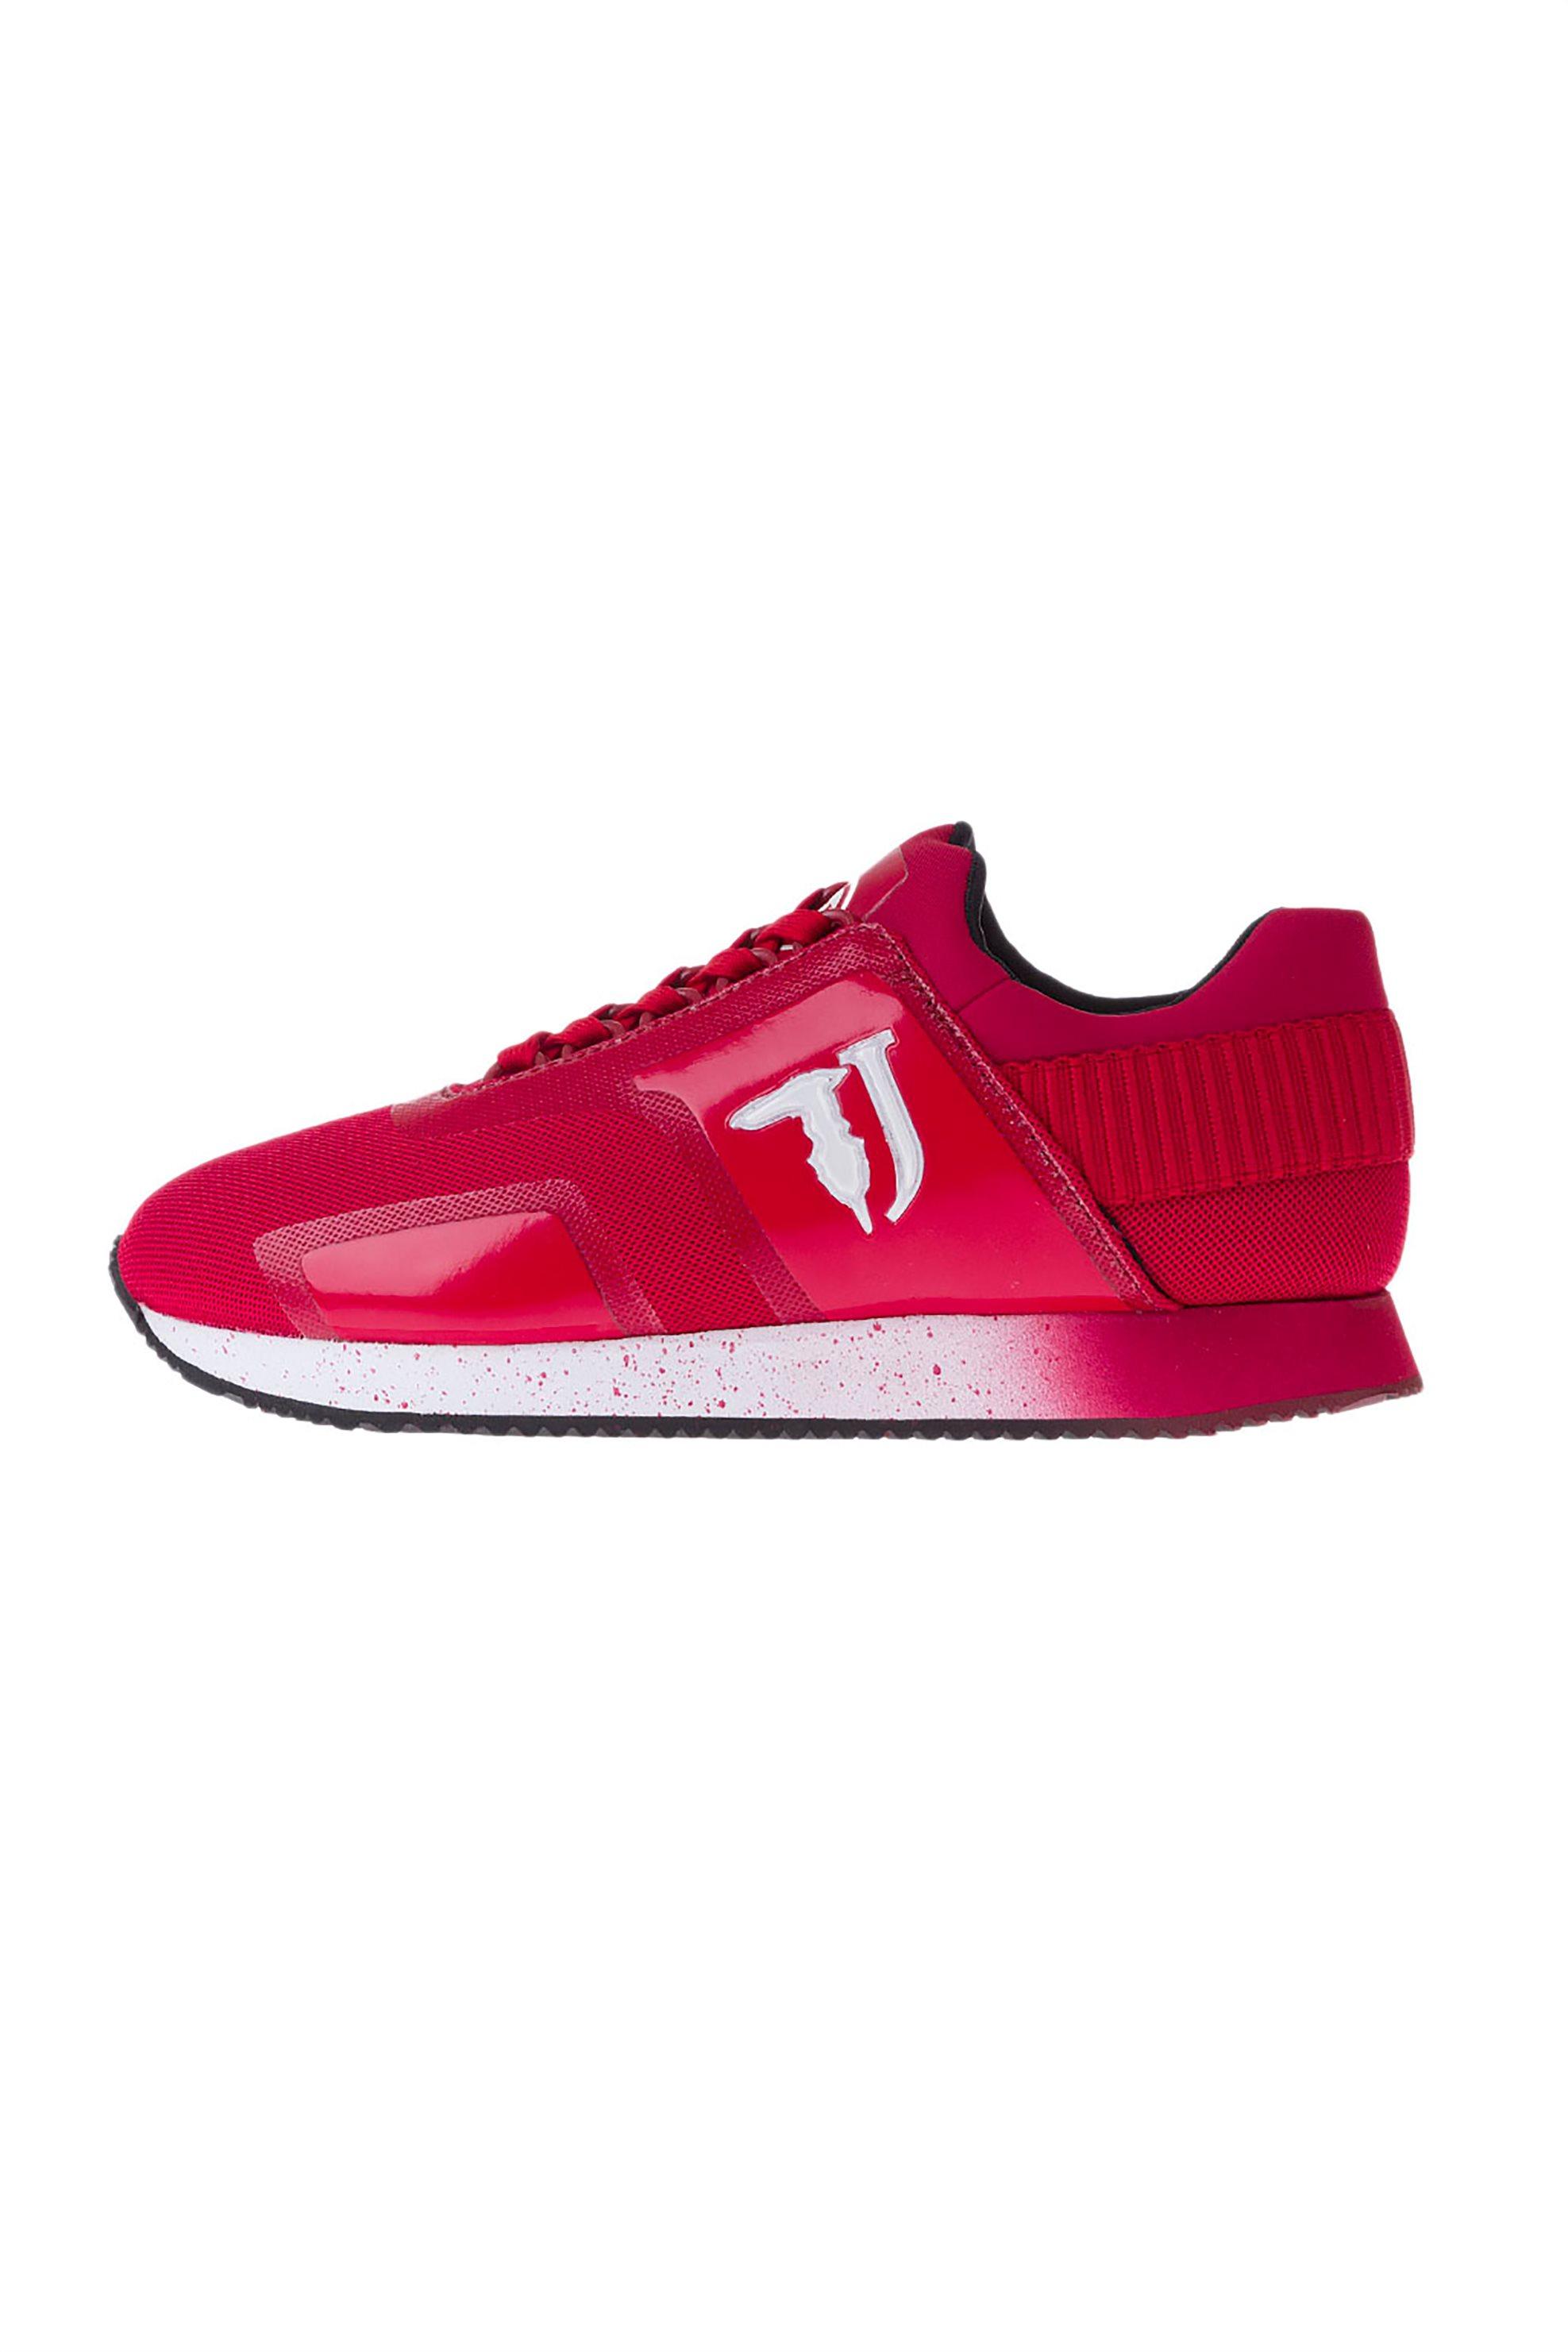 Trussardi Jeans ανδρικά sneakers με δερμάτινες και mesh λεπτομέρειες – 77A00154-9Y099999 – Κόκκινο